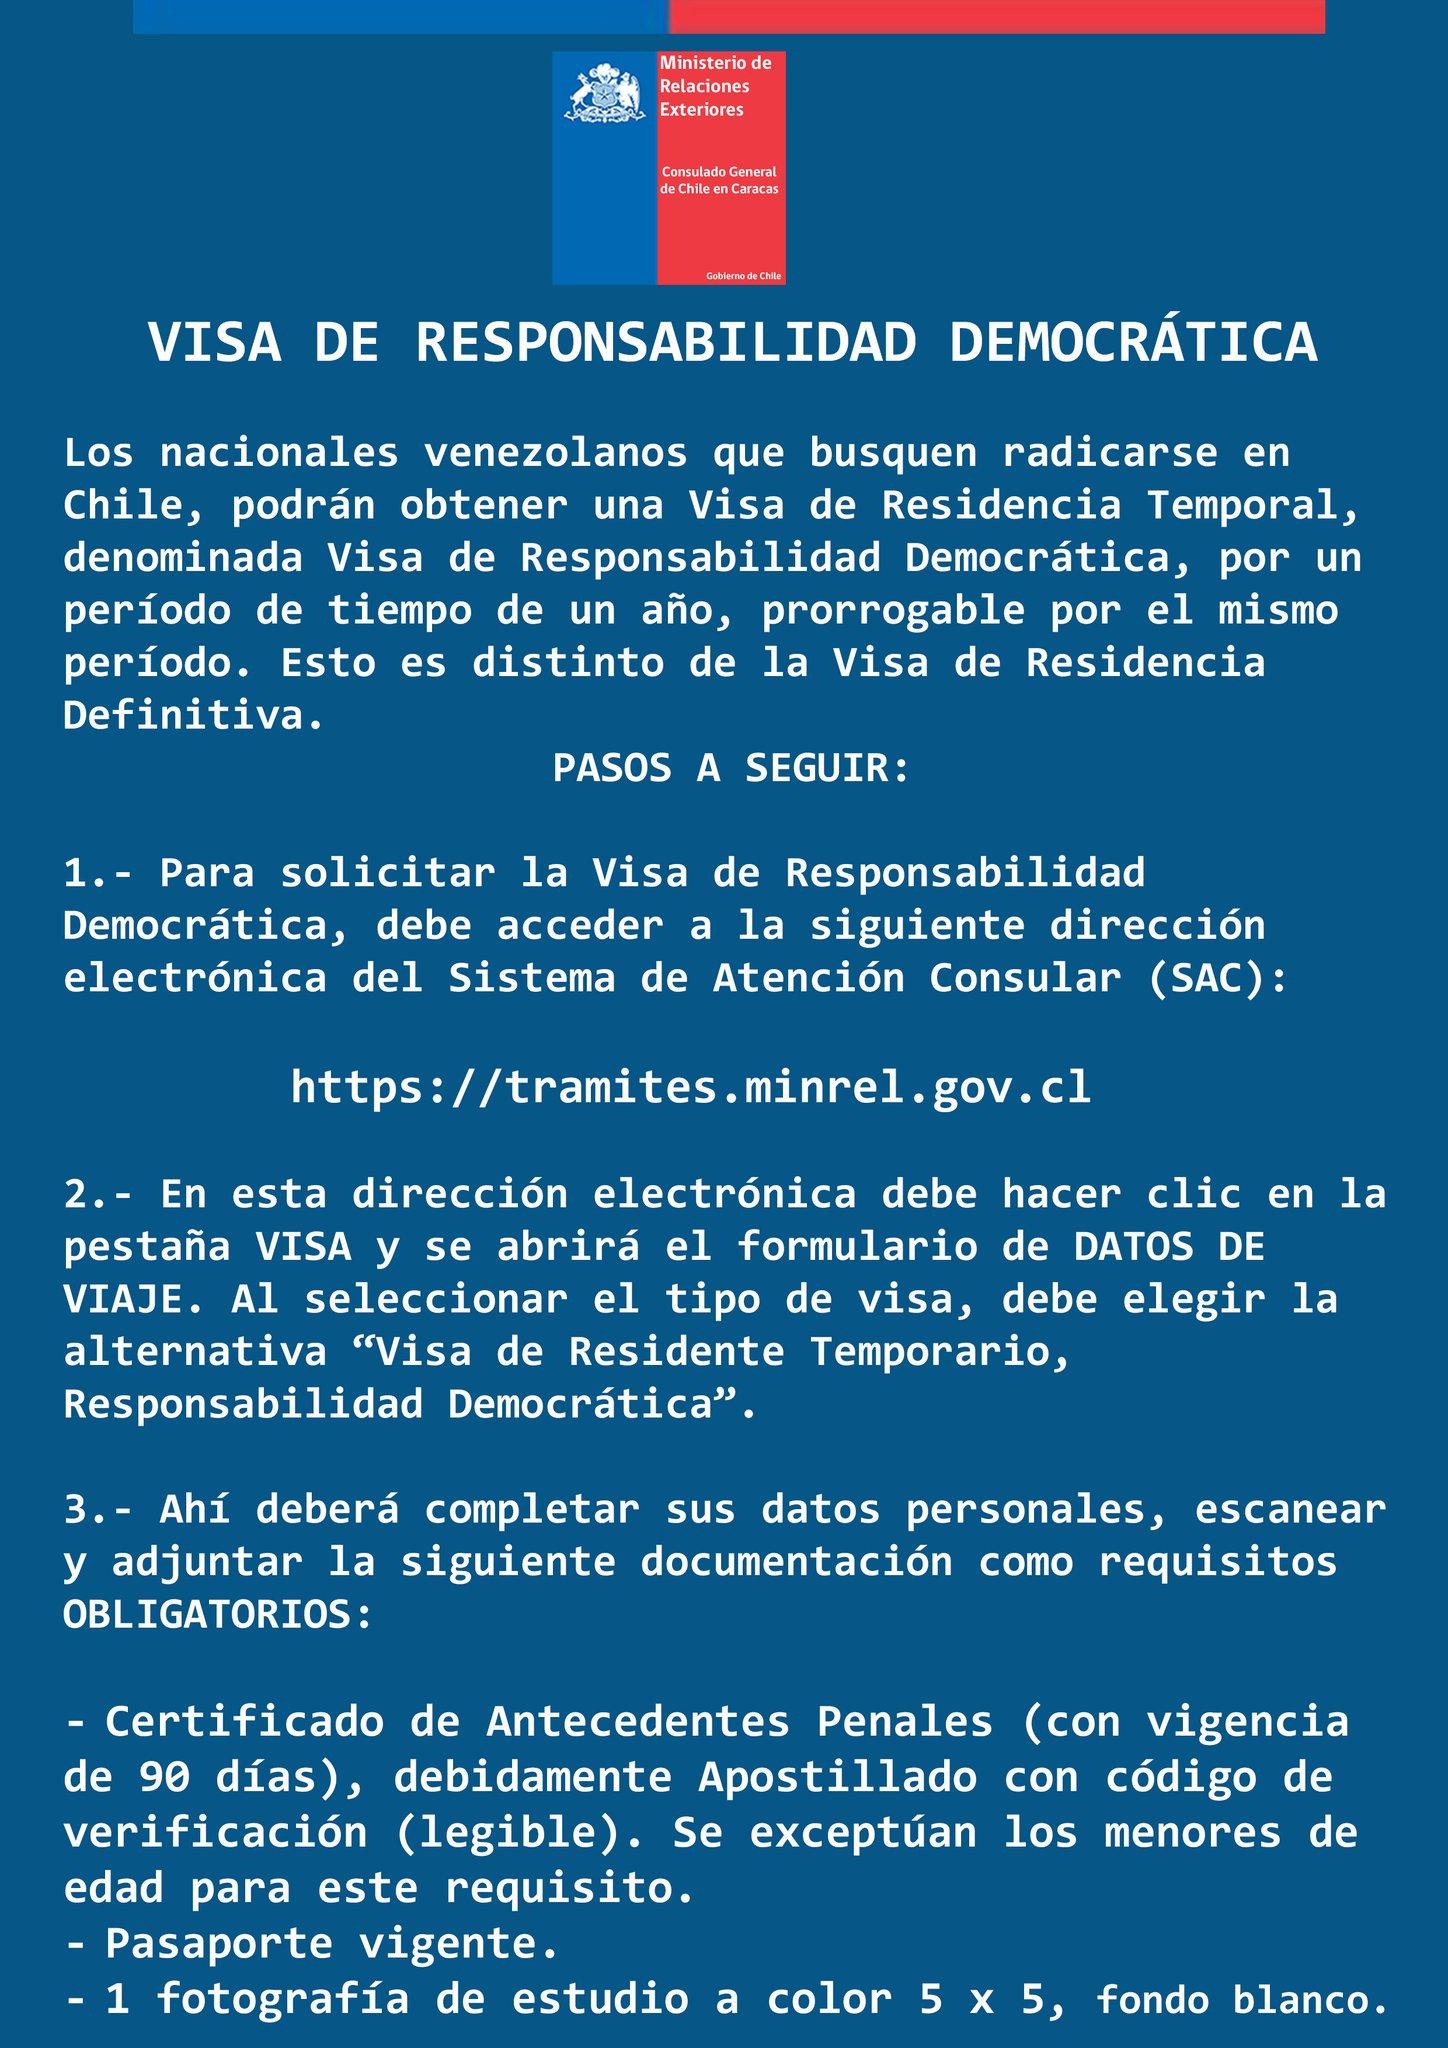 Consulado General De Chile En Caracas On Twitter